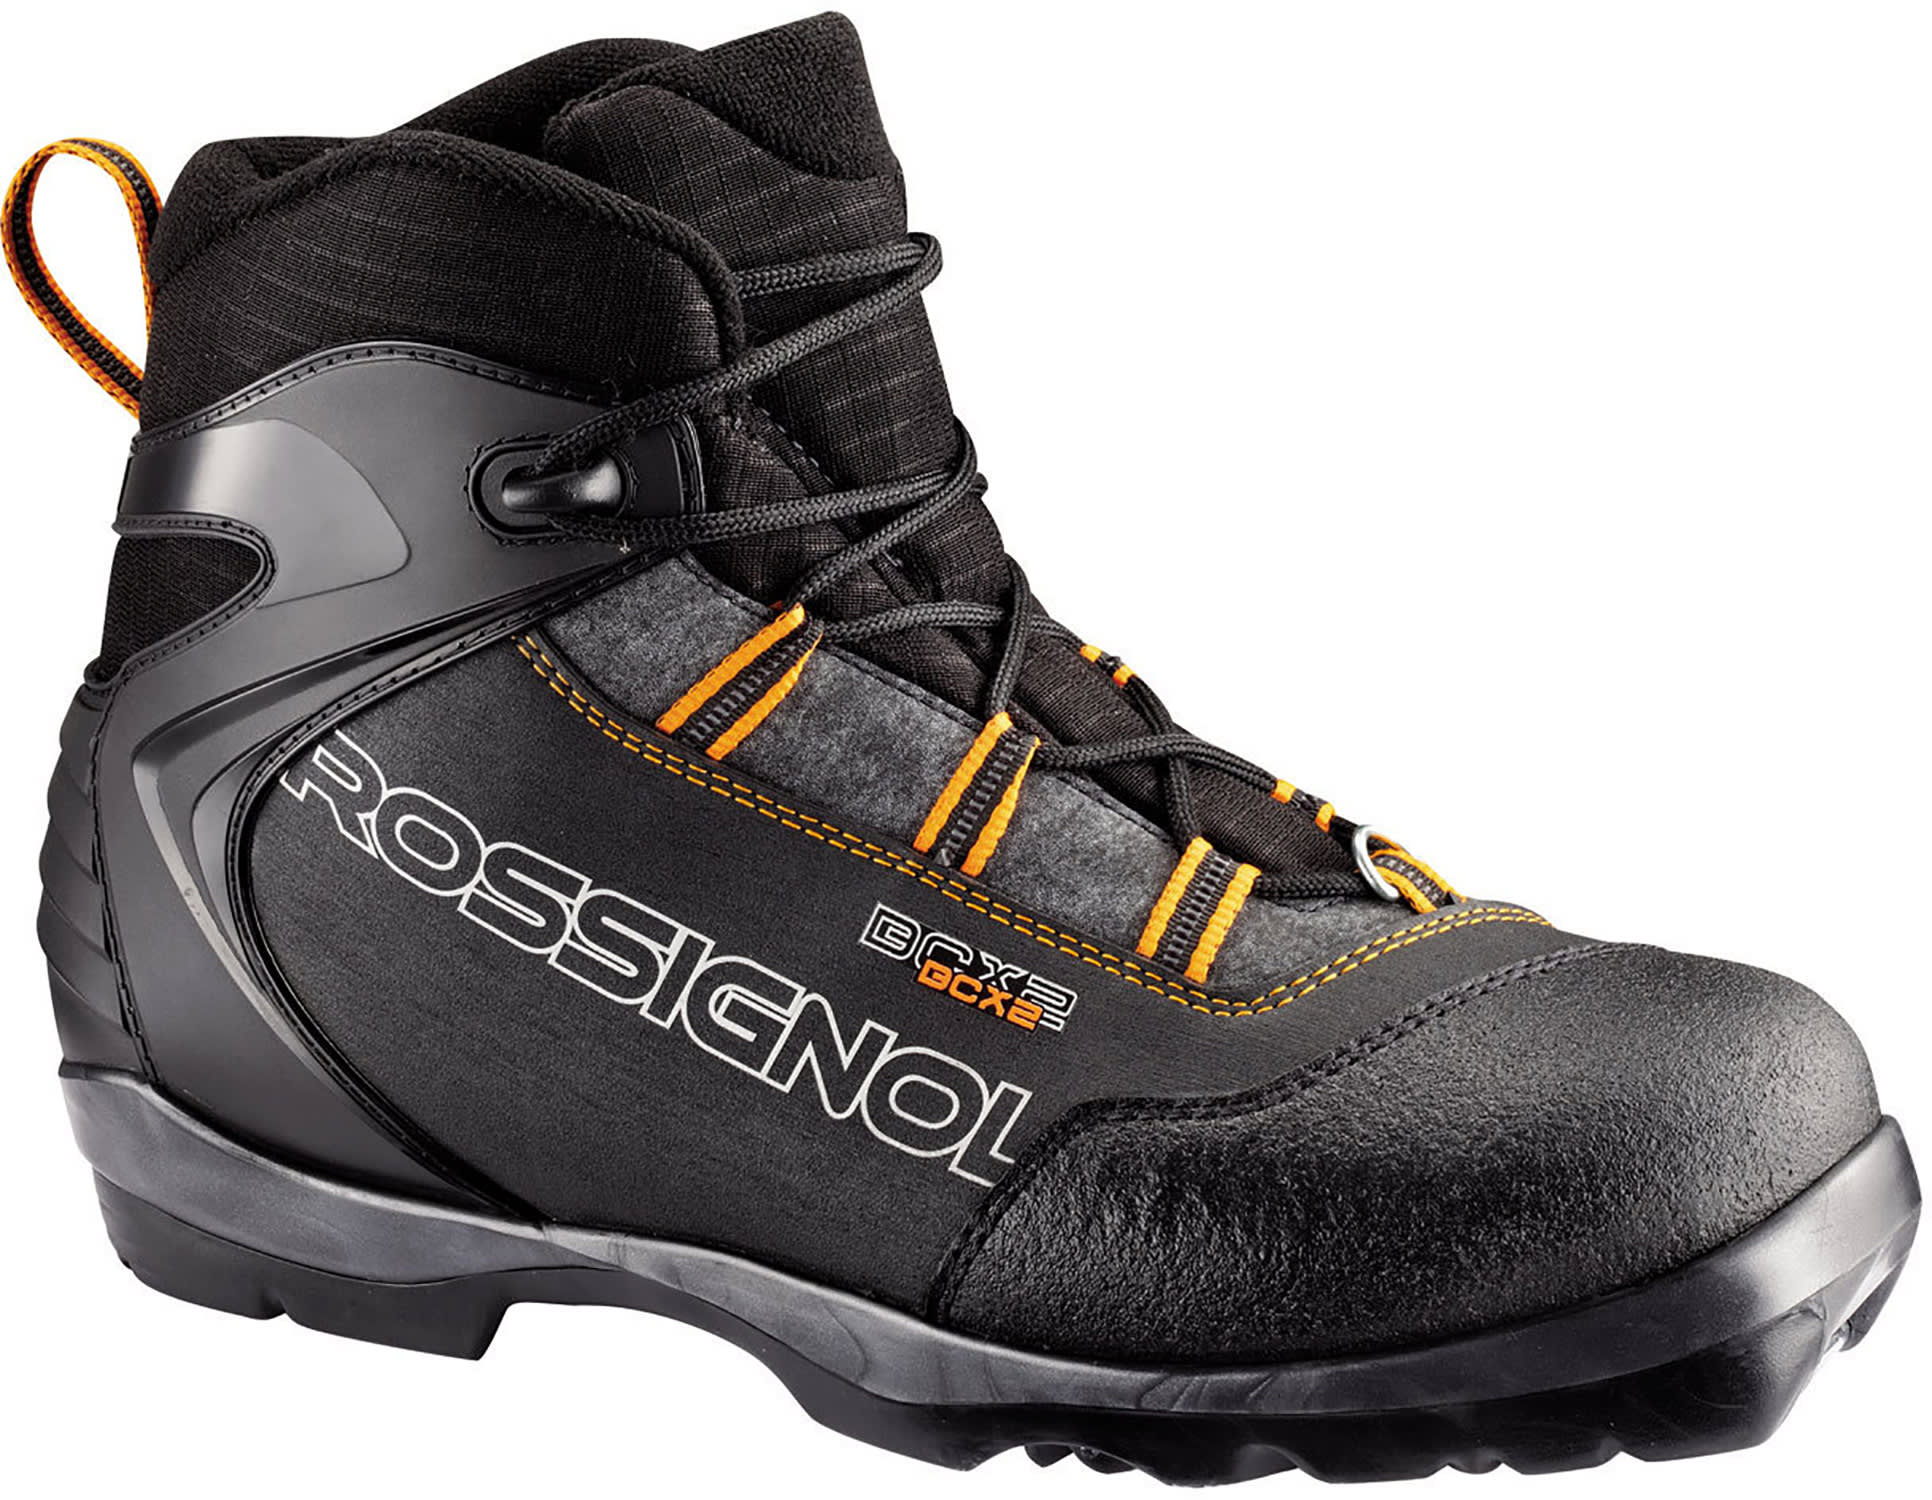 Rossignol Bc X 2 Xc Ski Boots Sz 10 Mens